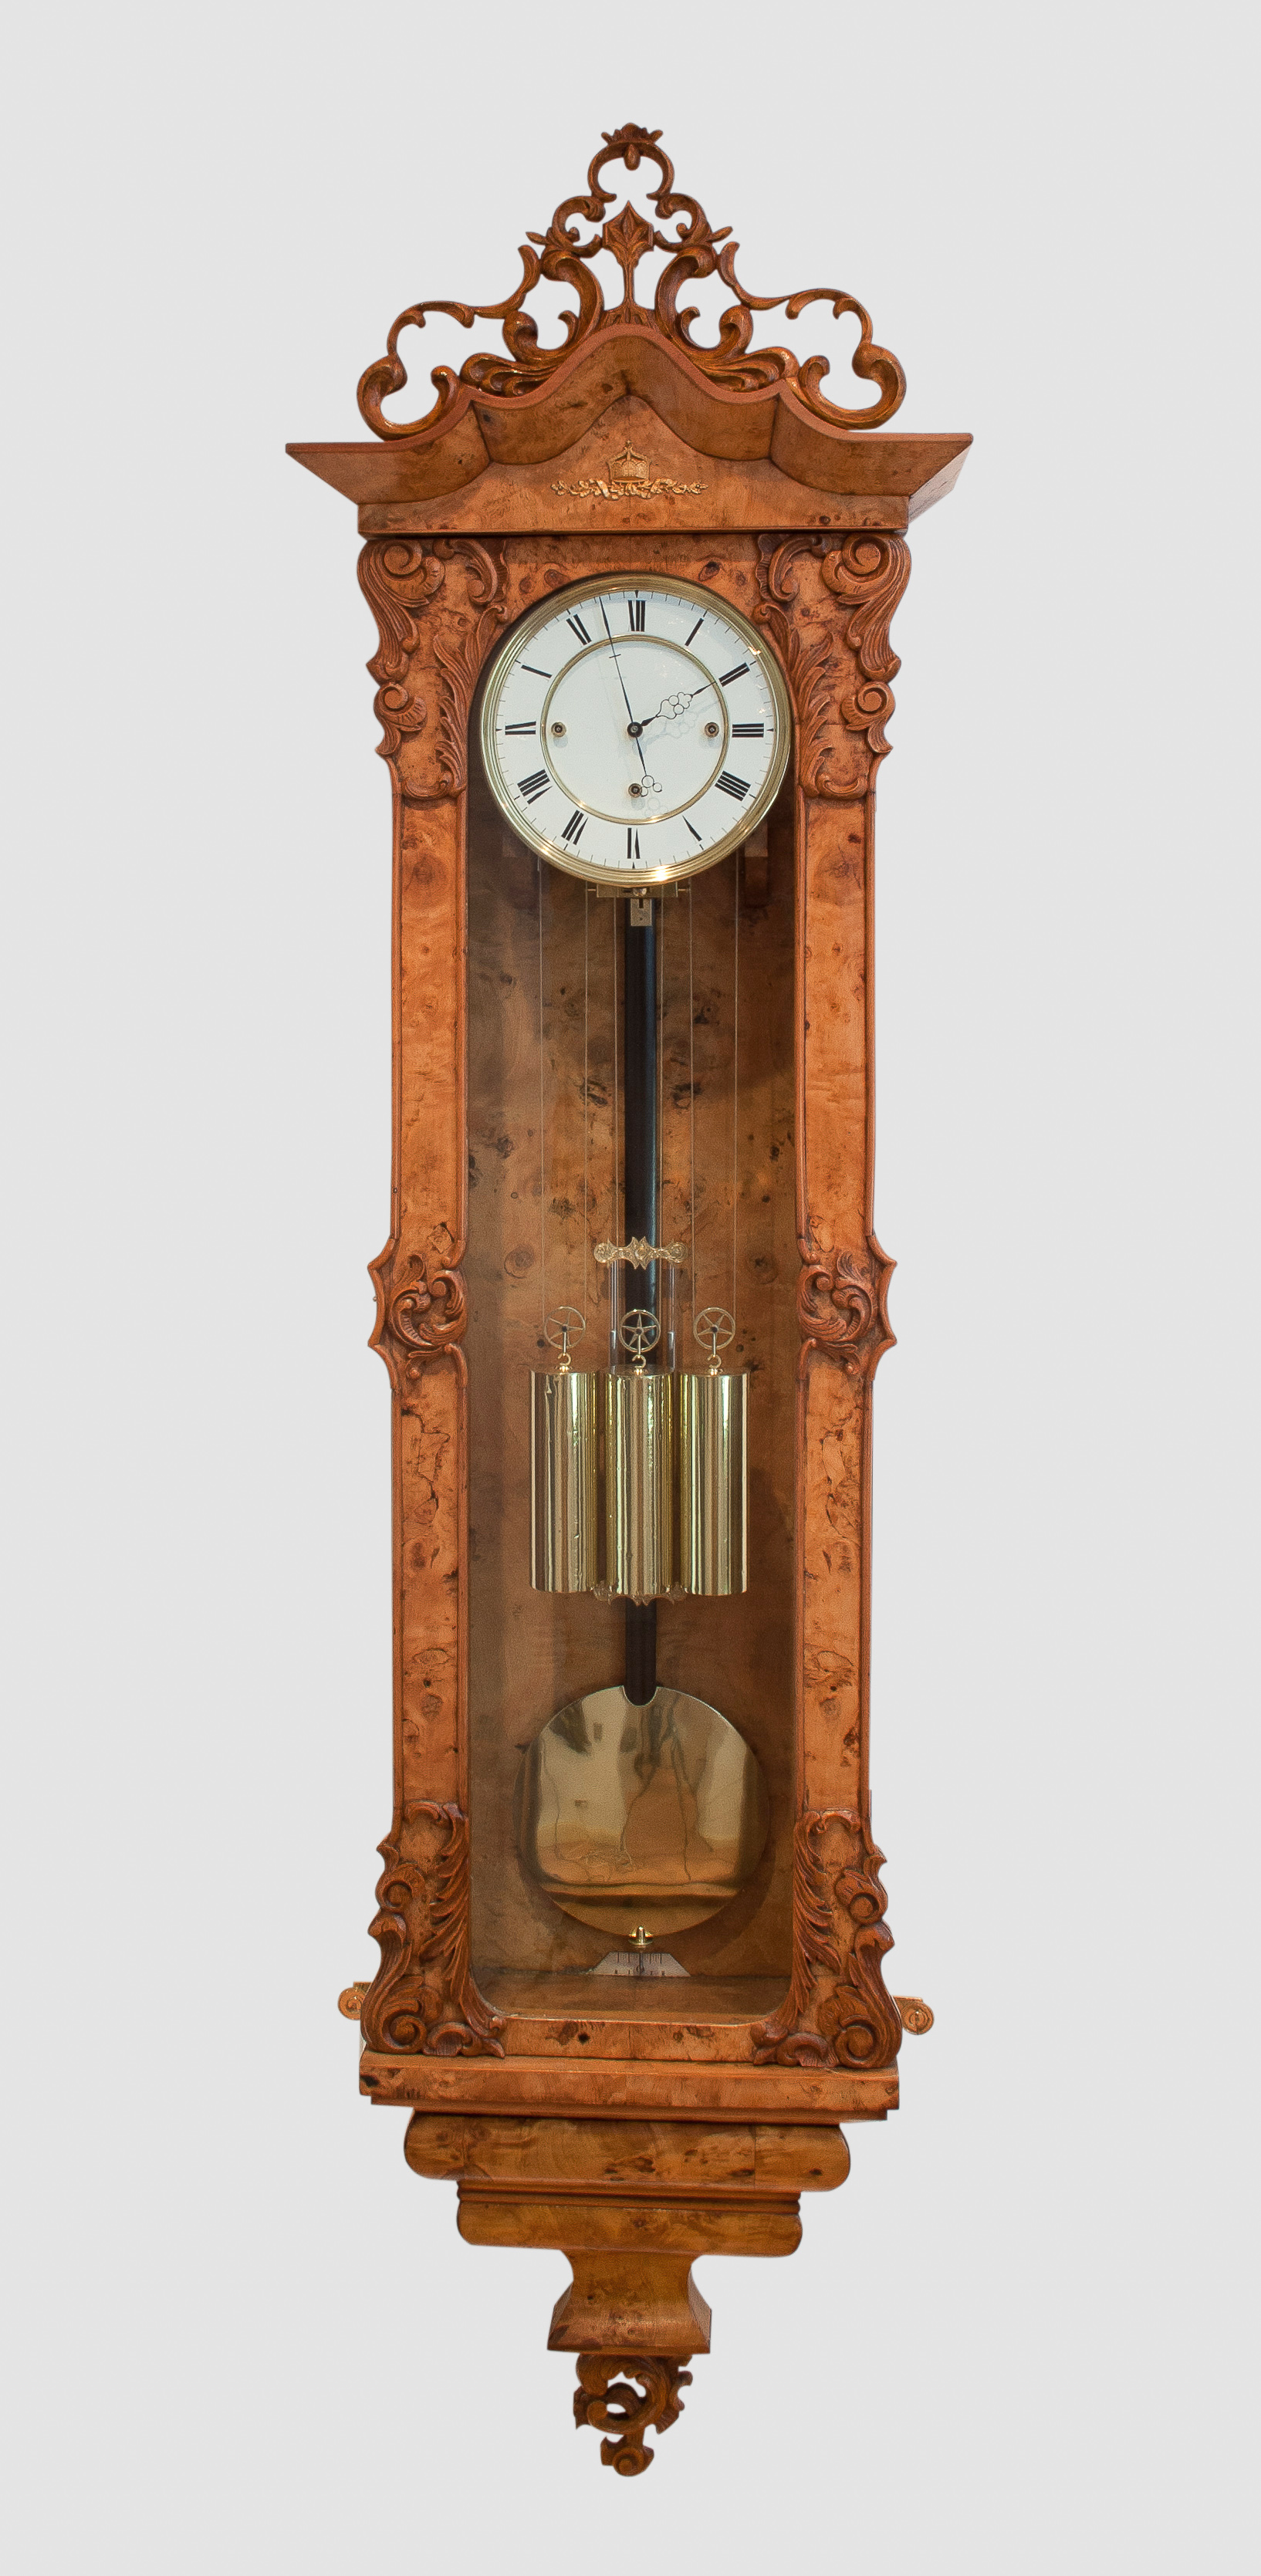 Story Antique Clocks image (7 of 11)